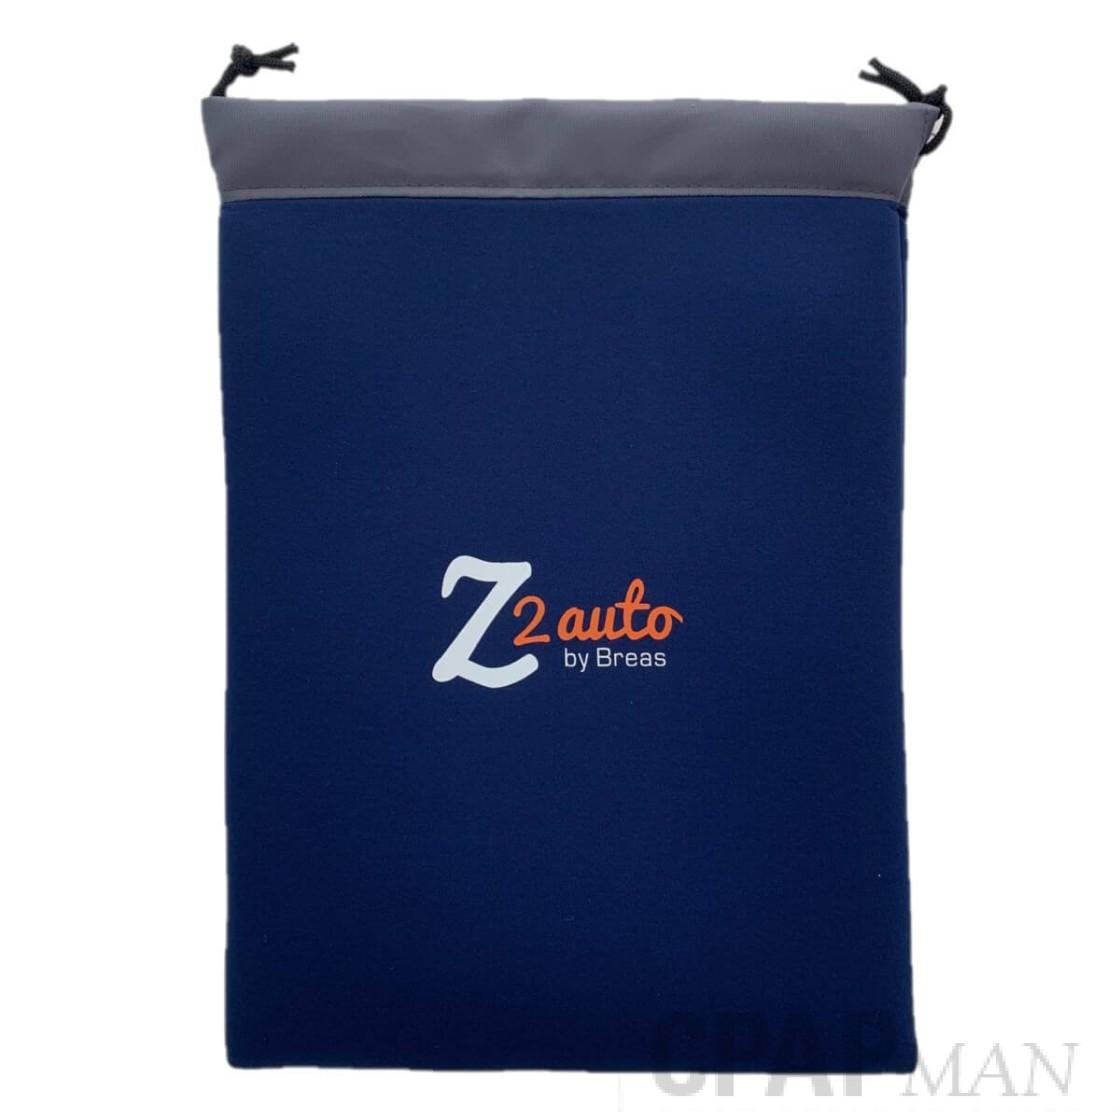 HDM Z2 CPAP Premium Travel Bag